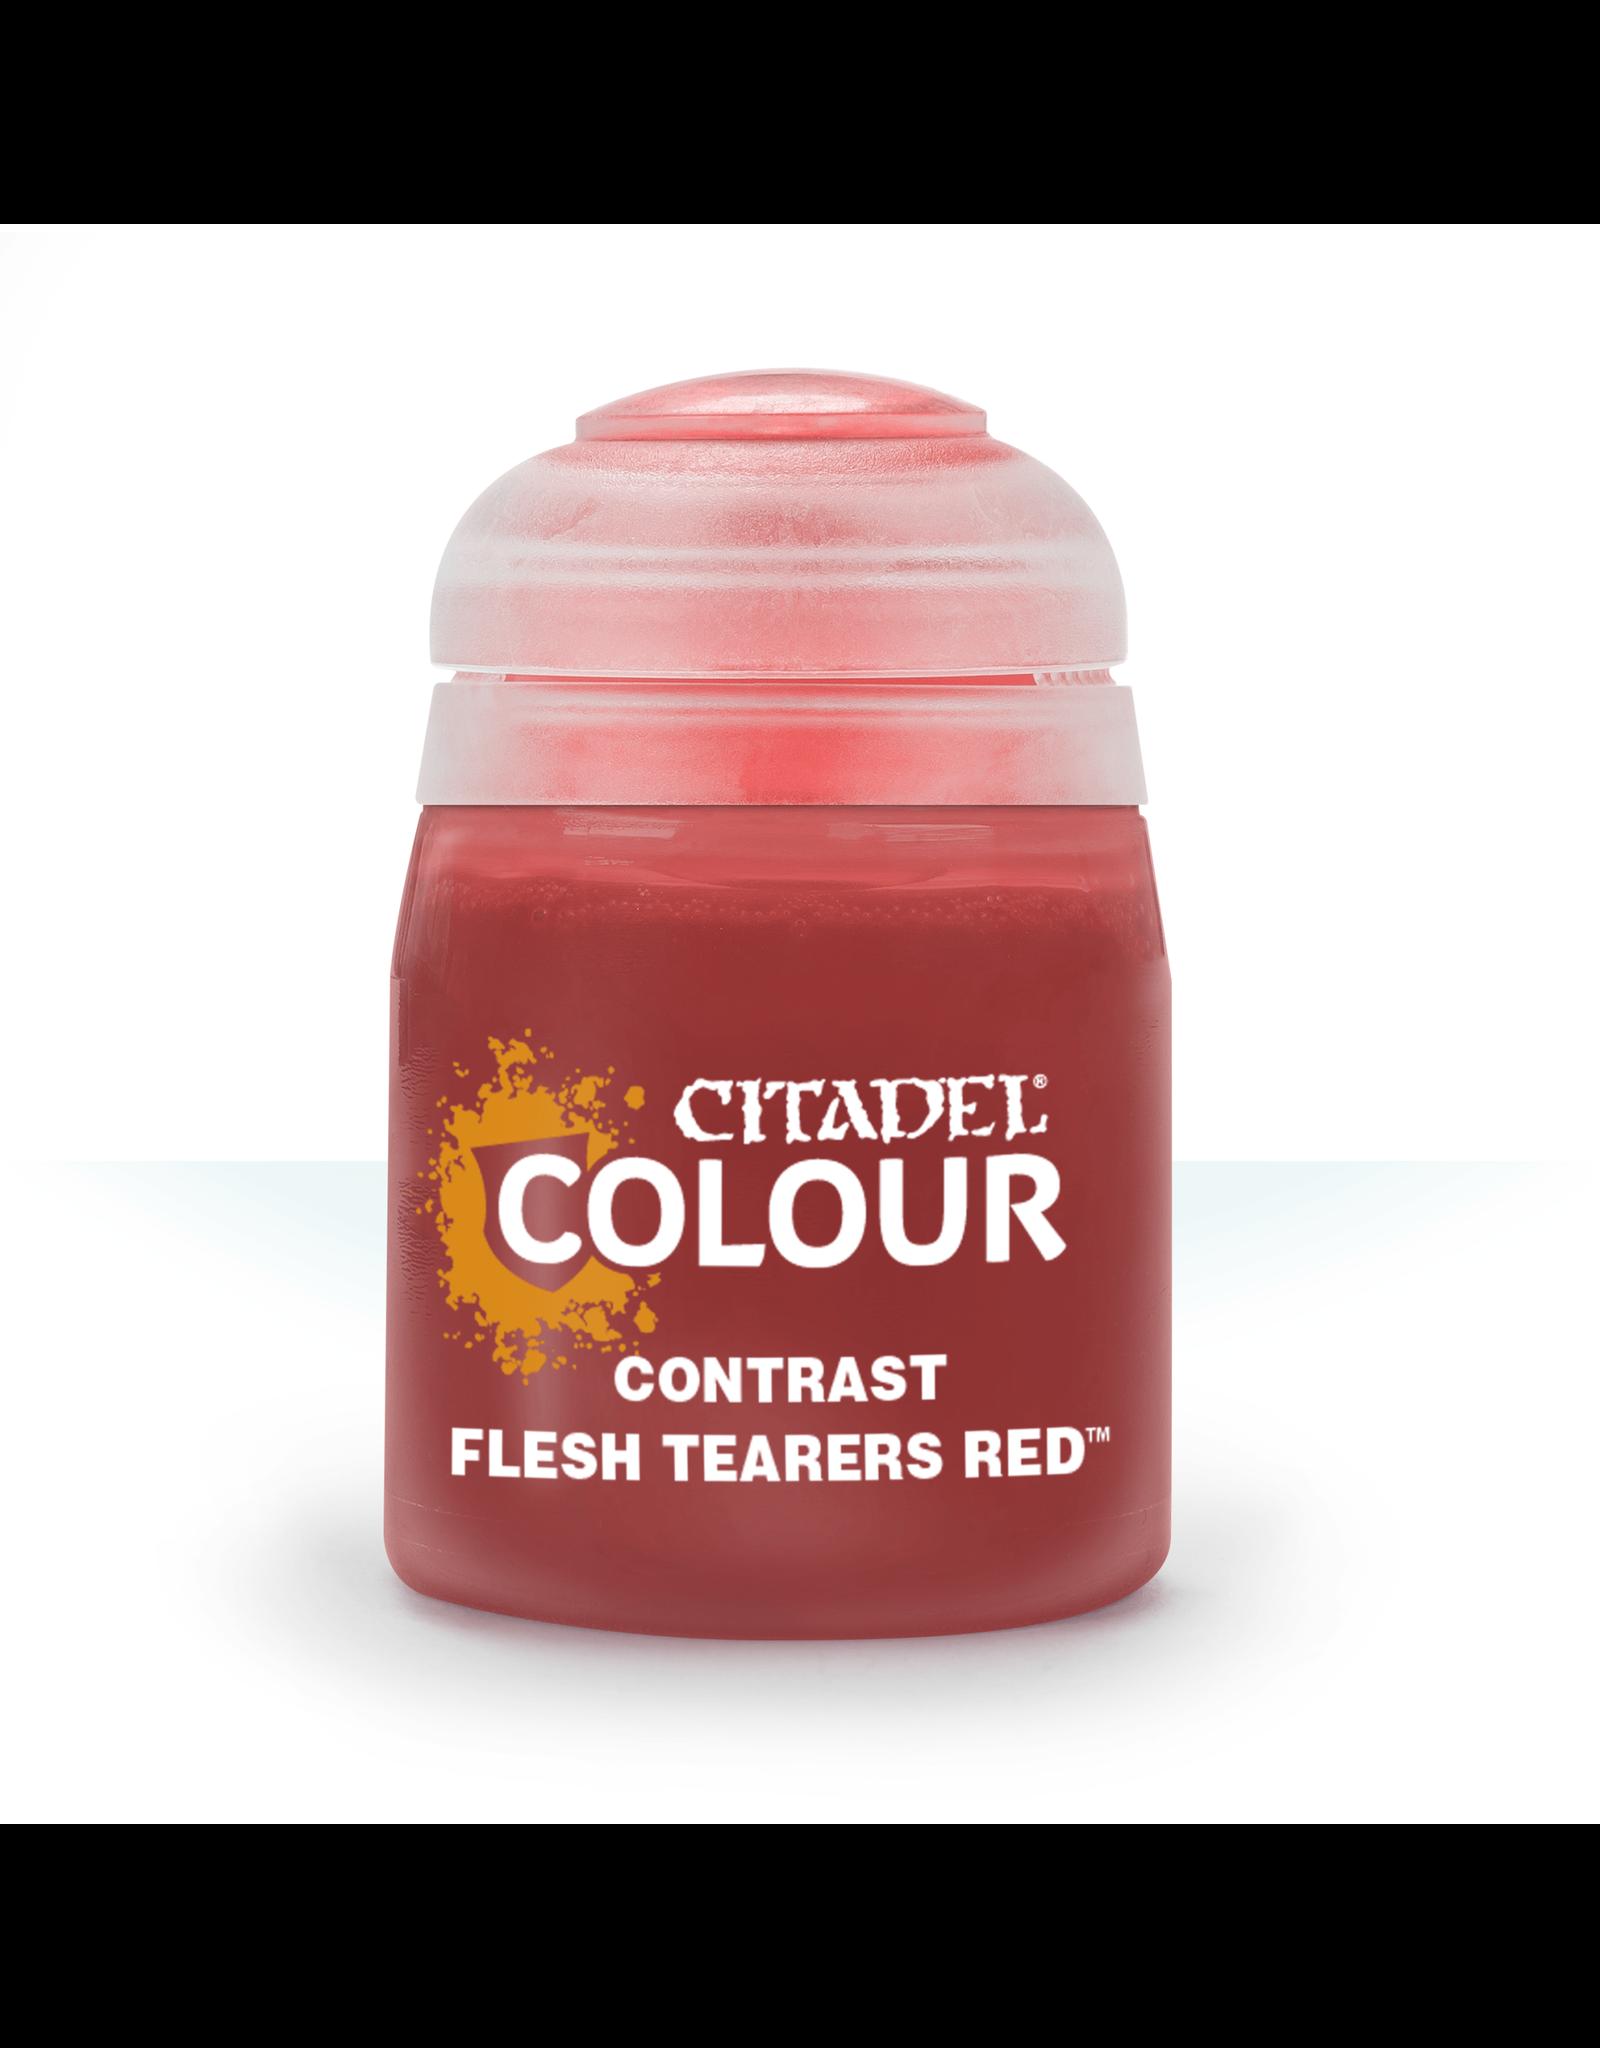 Citadel Flesh Tearers Red